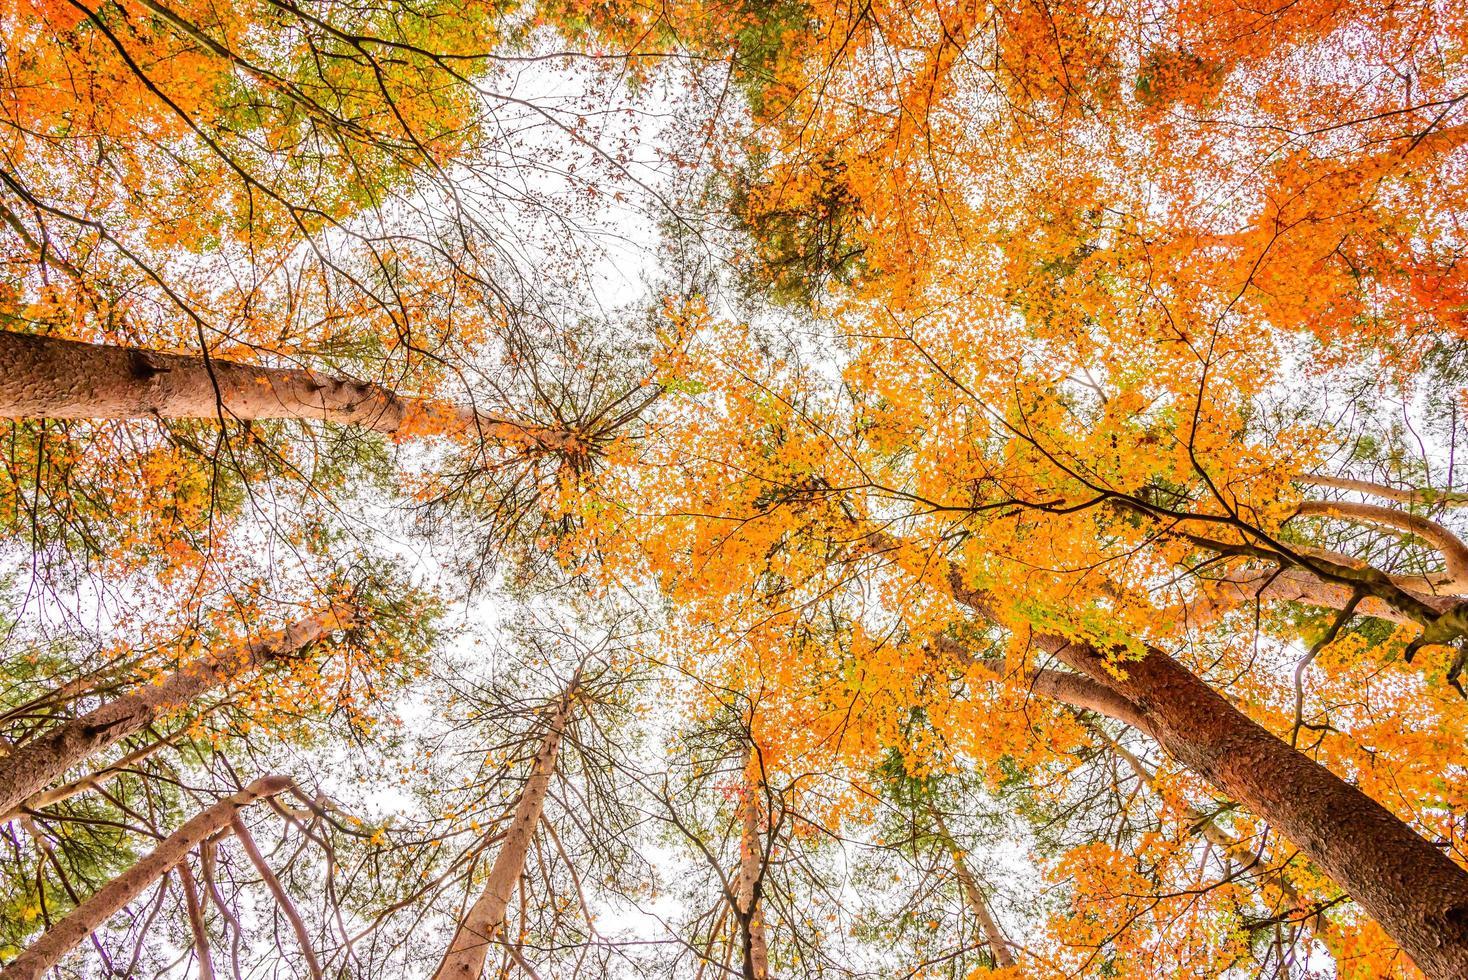 arces en otoño foto